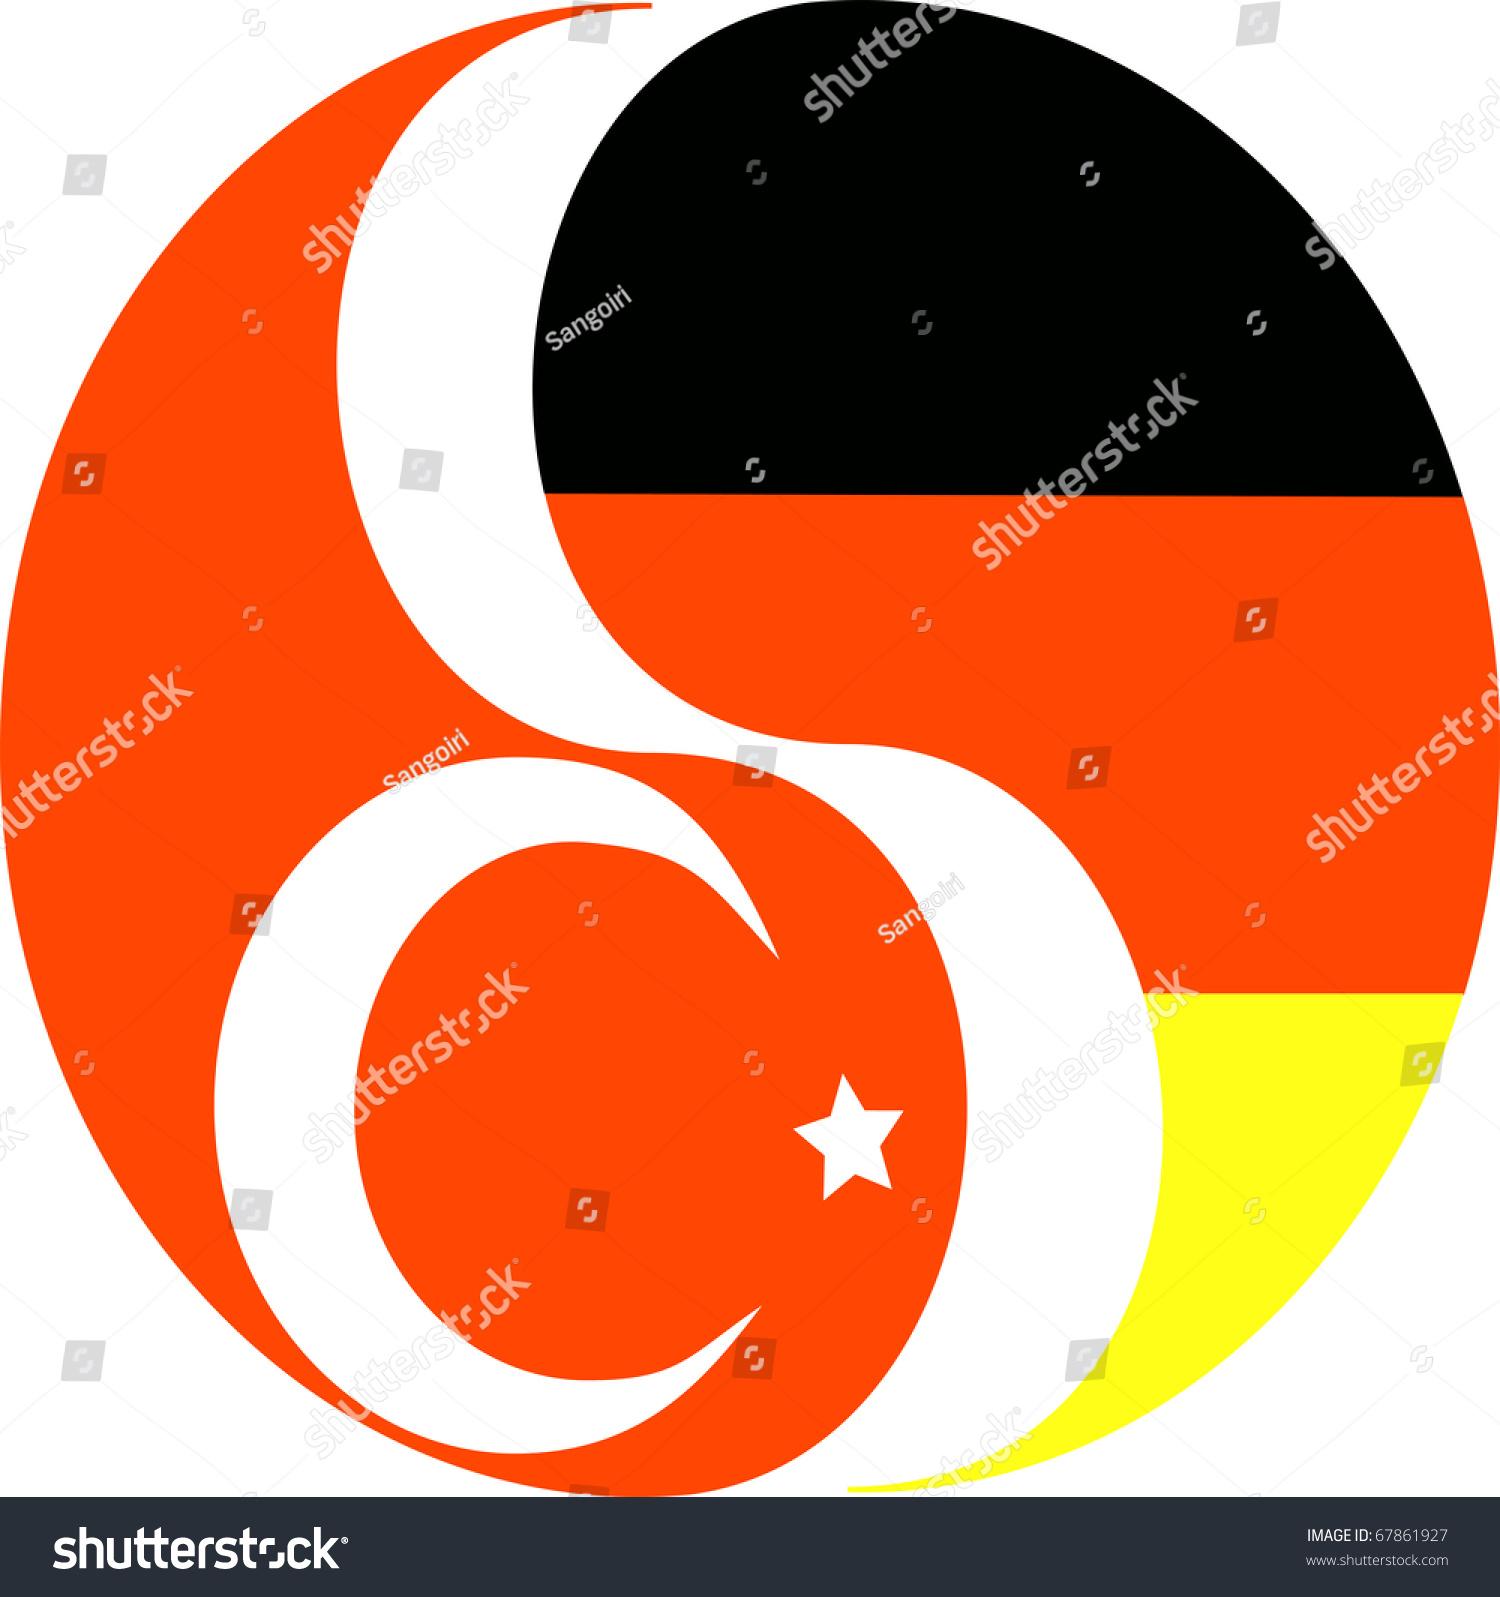 German turkish relationship symbol describe relationship stock a symbol to describe the relationship between germany and turkey buycottarizona Choice Image